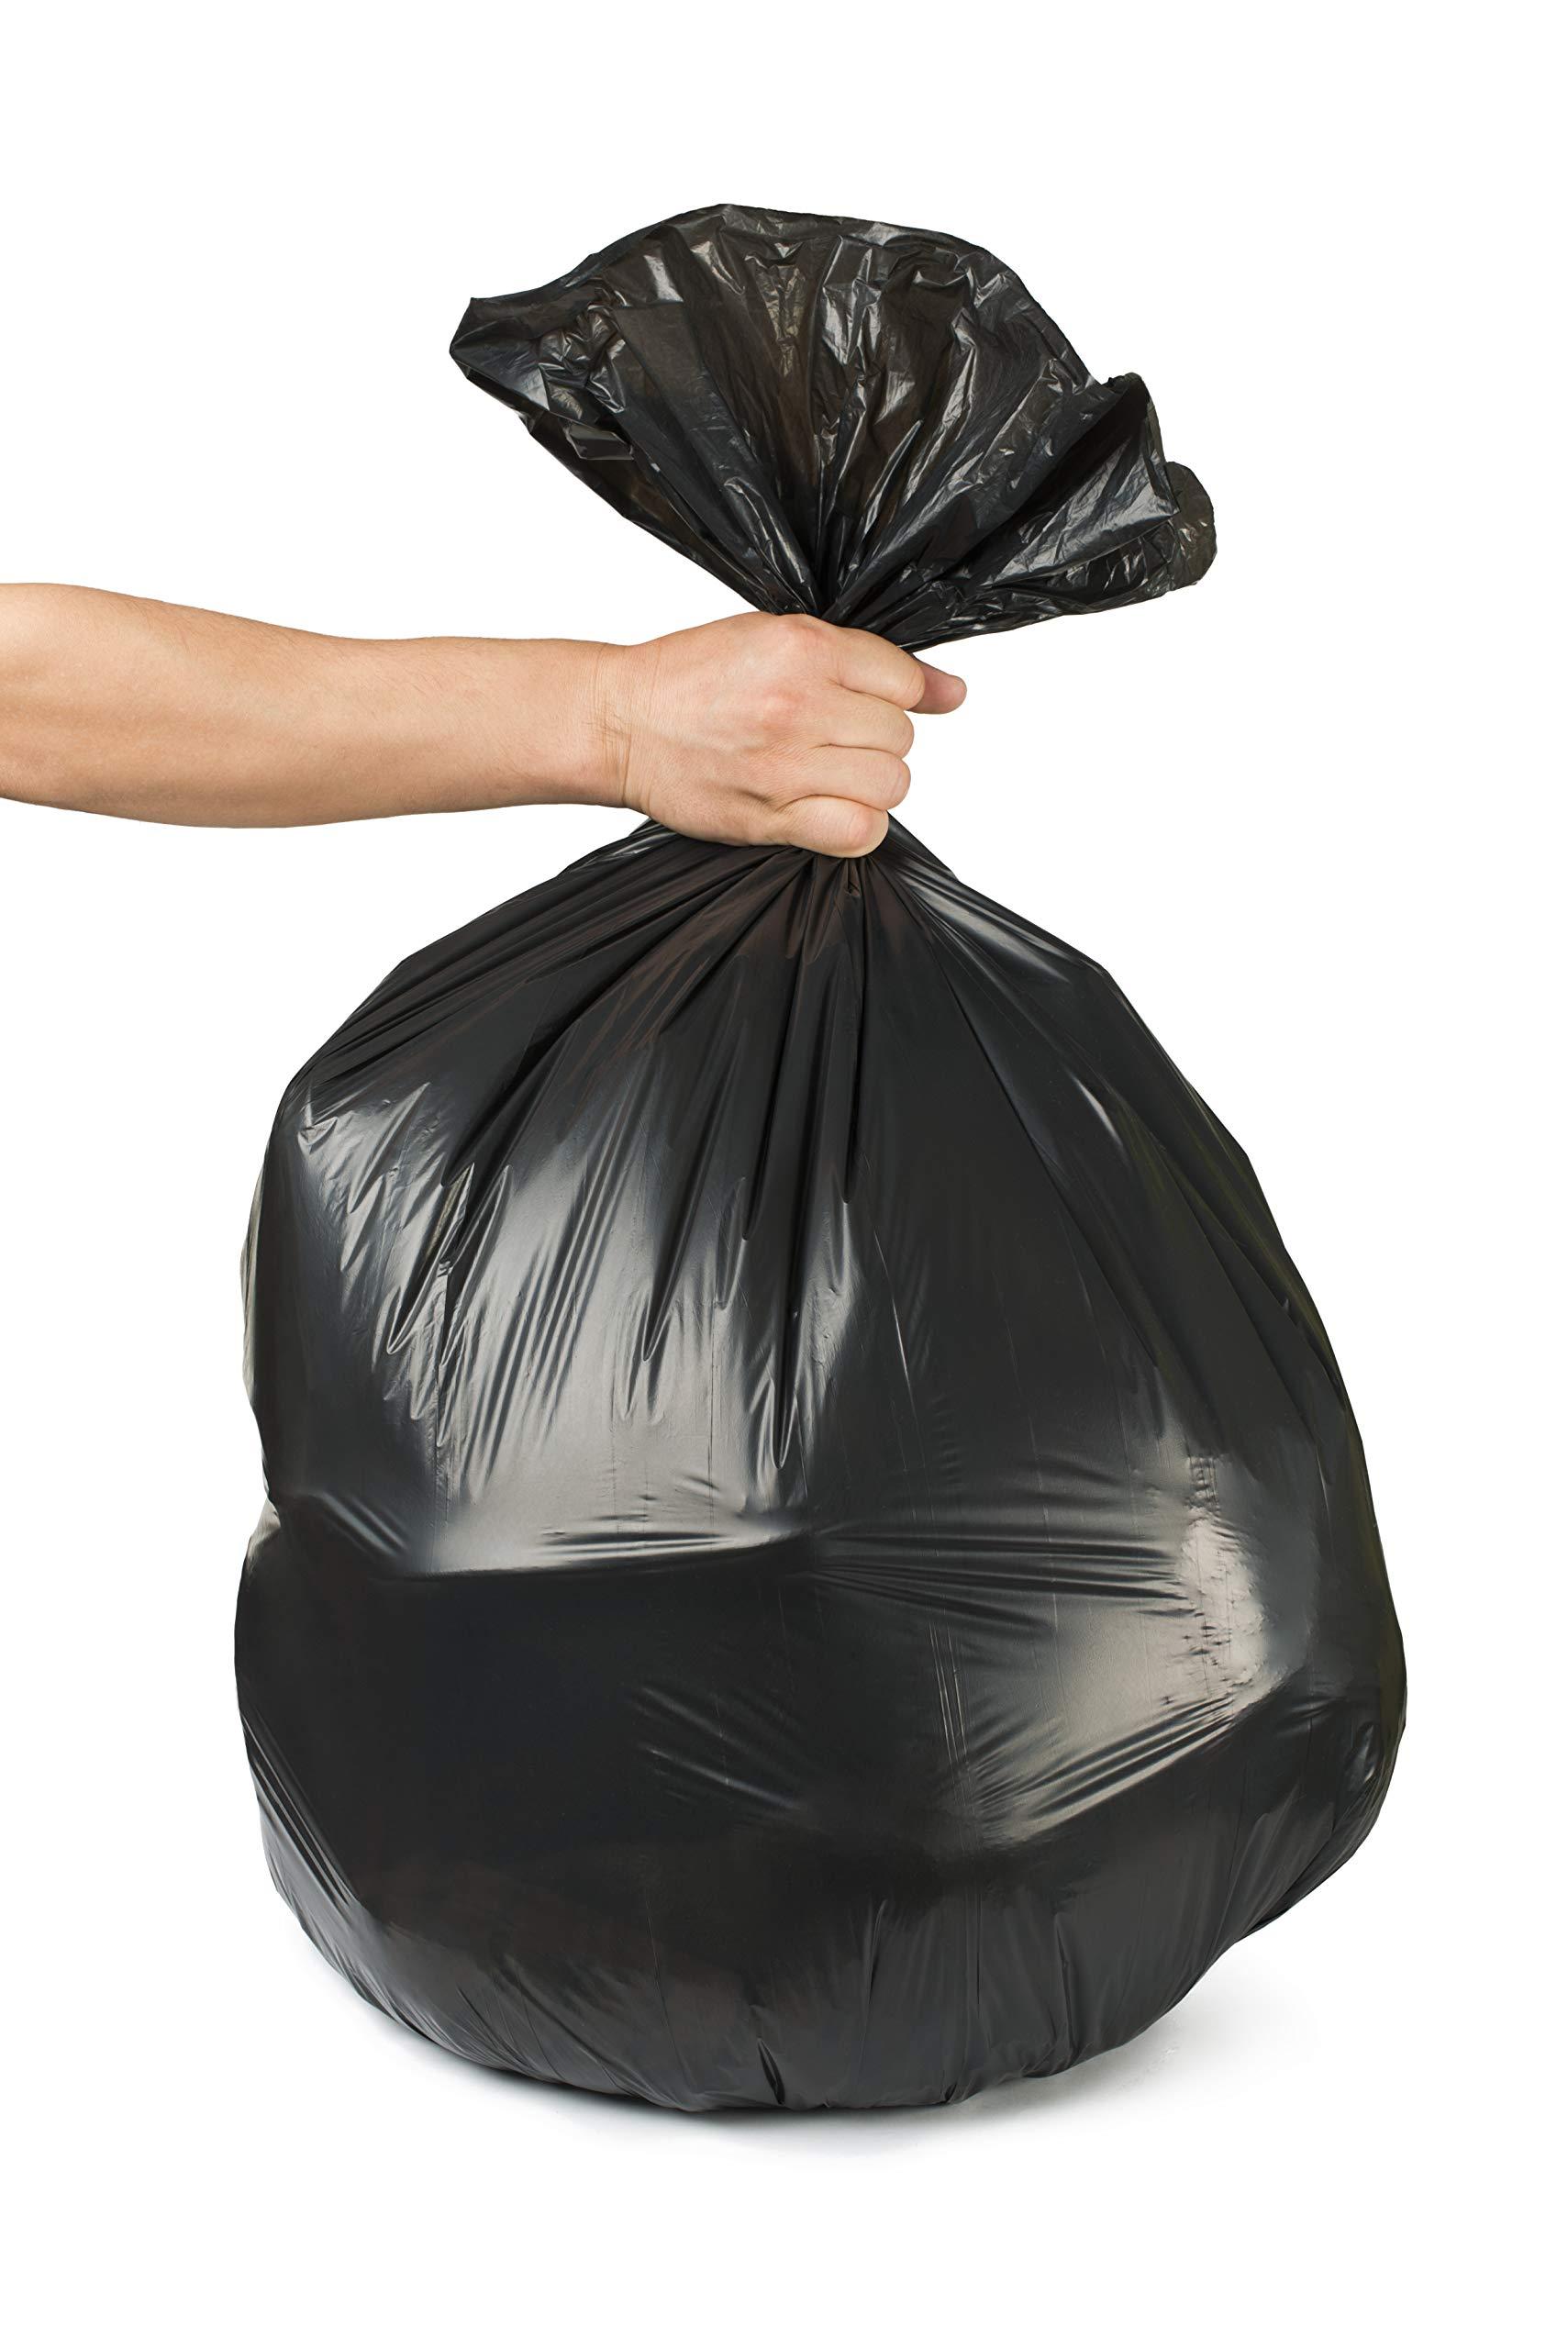 Toughbag 95 Gal Trash bags, Black, 2 Mil, 61x68, 25 Garbage Bags Per Case by ToughBag (Image #5)